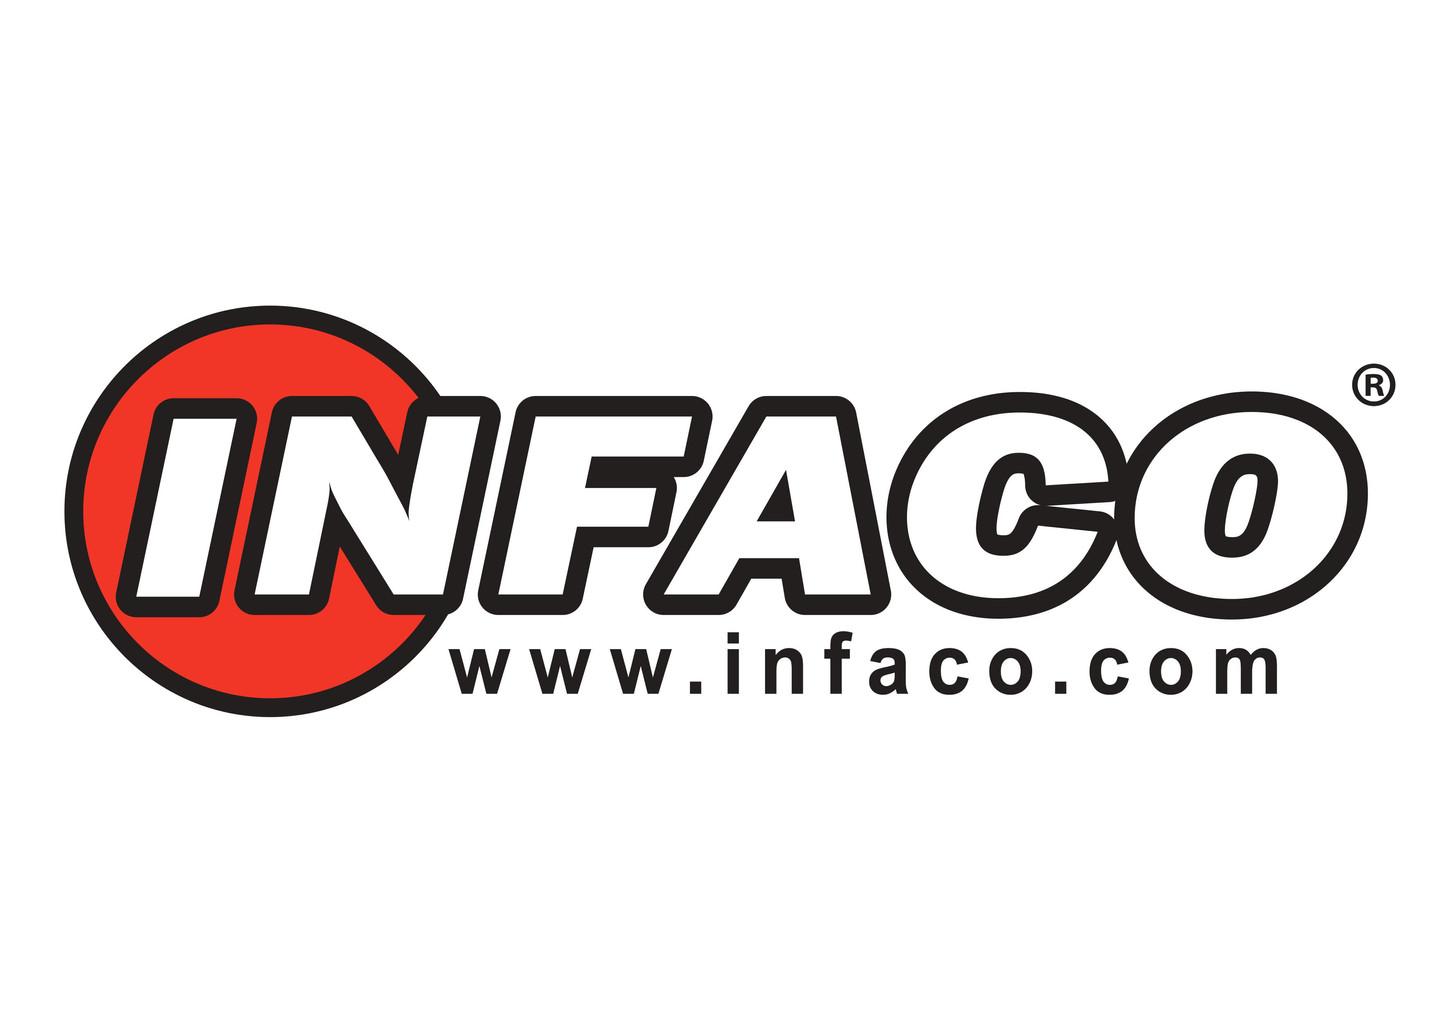 Infaco.jpg